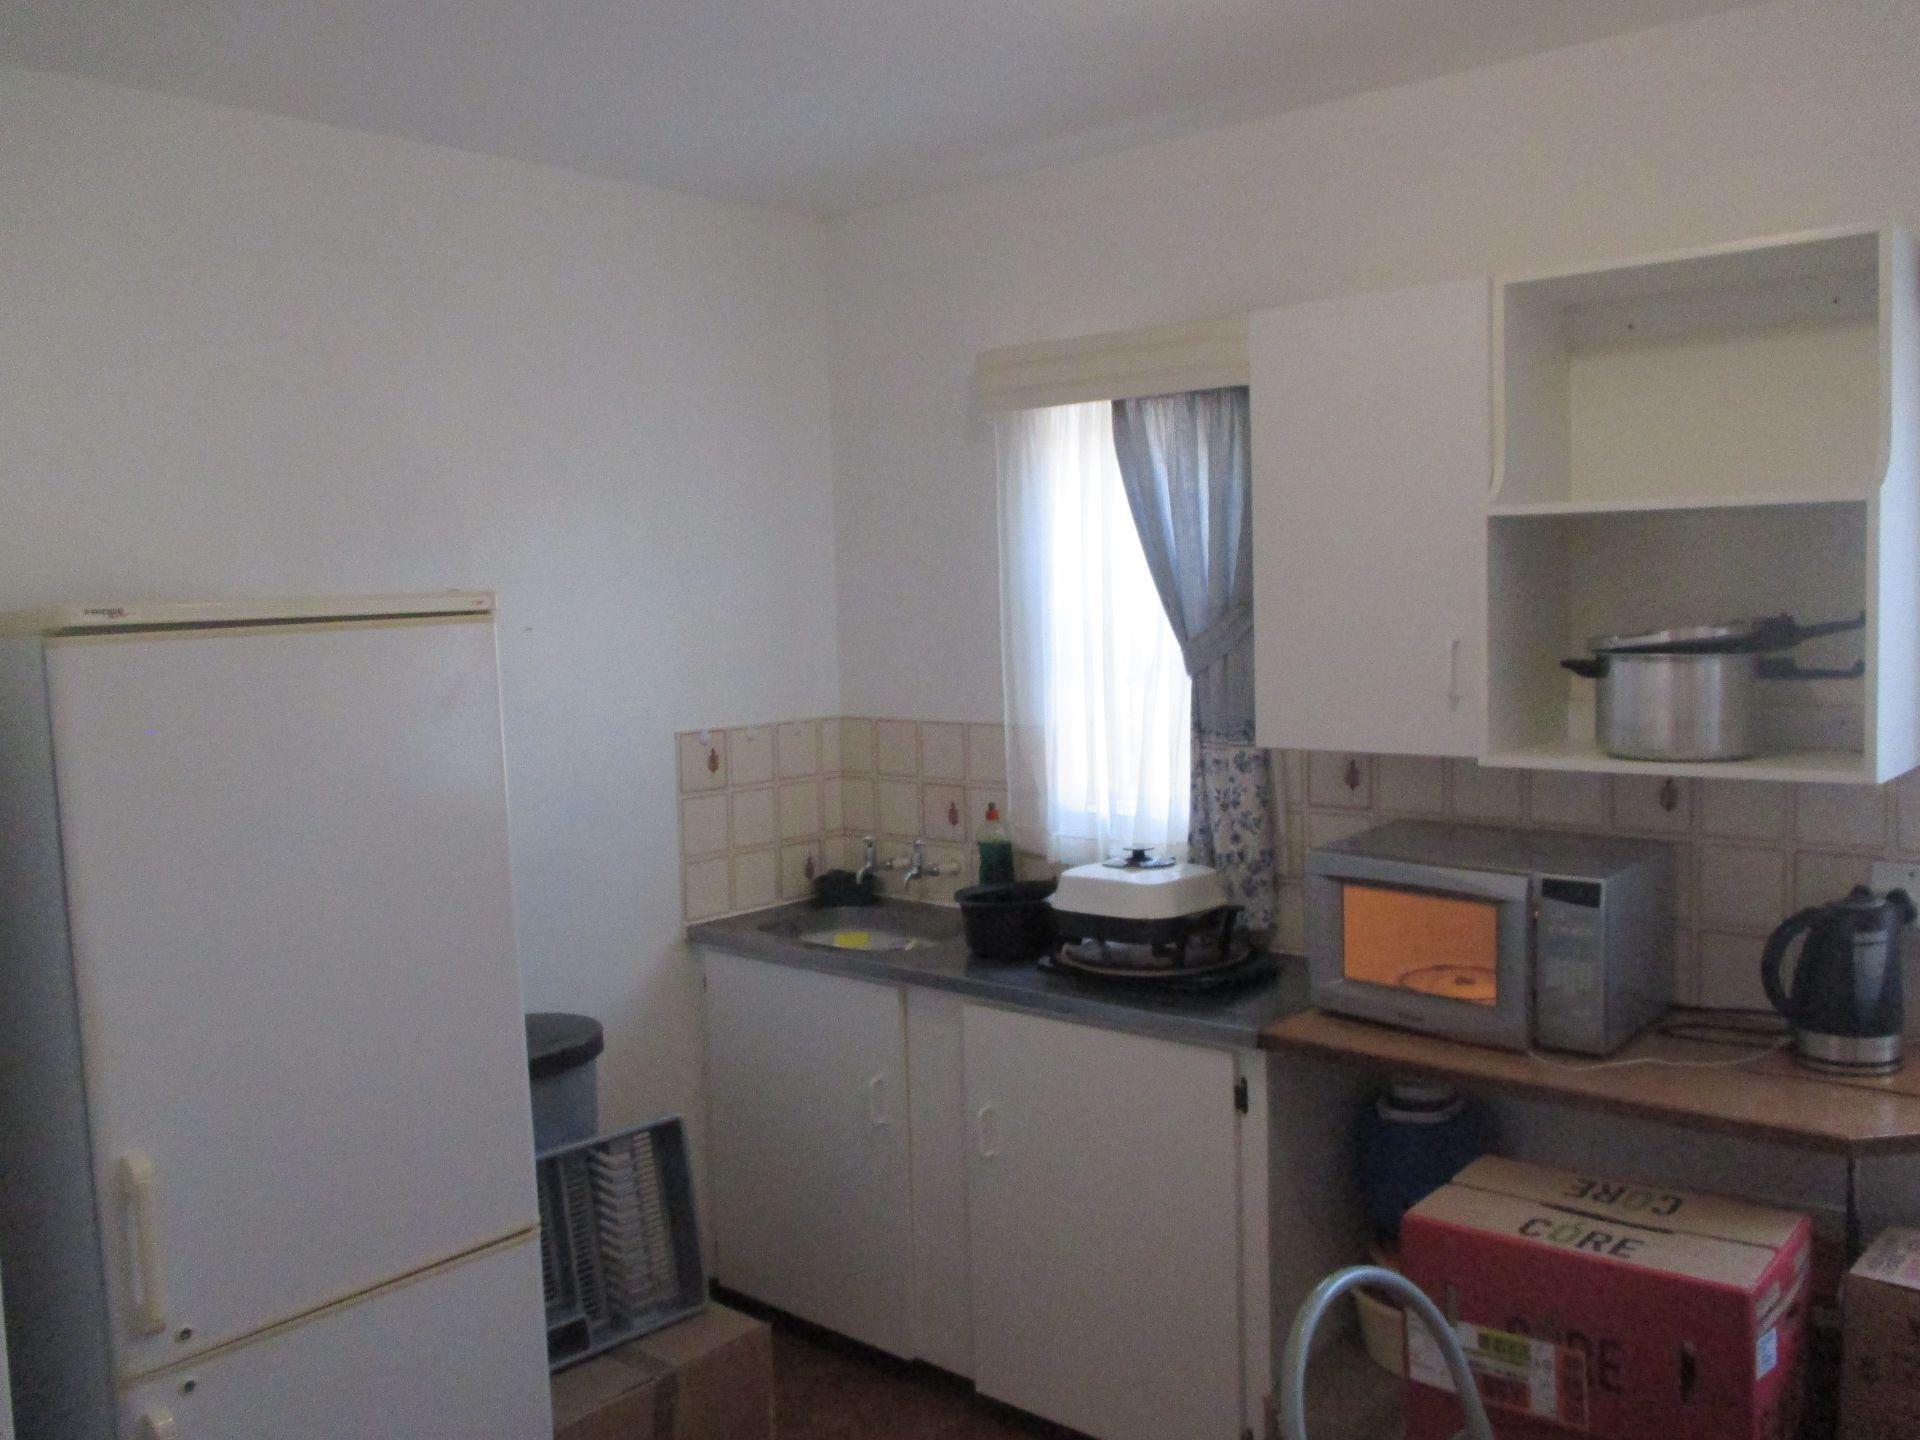 Baillie Park property for sale. Ref No: 13486345. Picture no 8